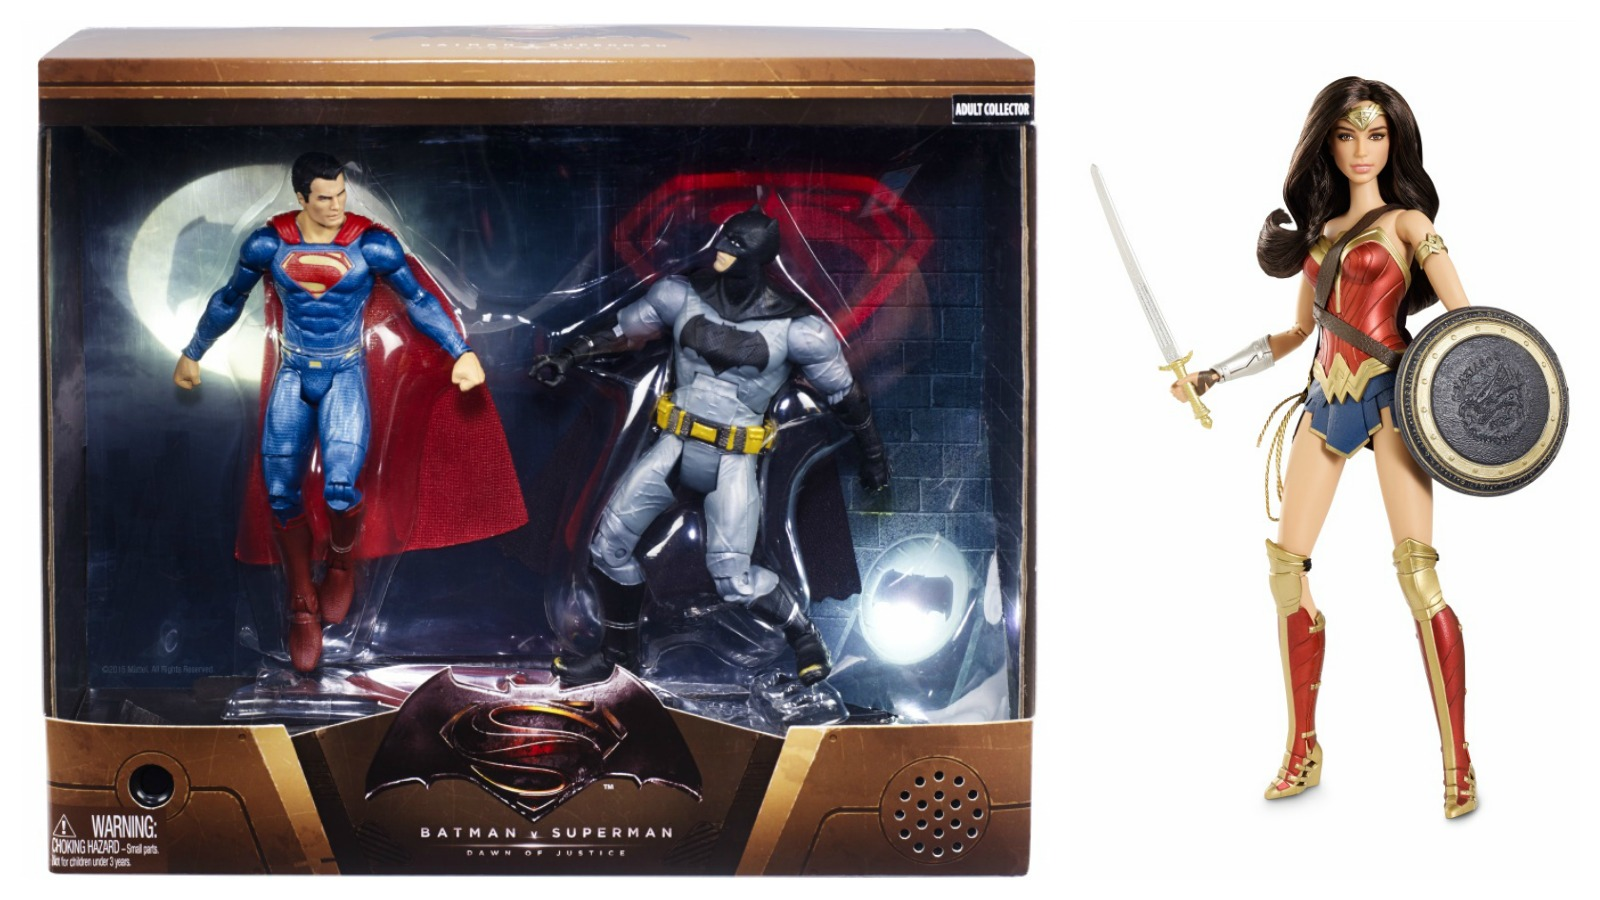 Sdcc 2015 And Webswipe Mattel Batman V Superman Exclusives - Usa -6806